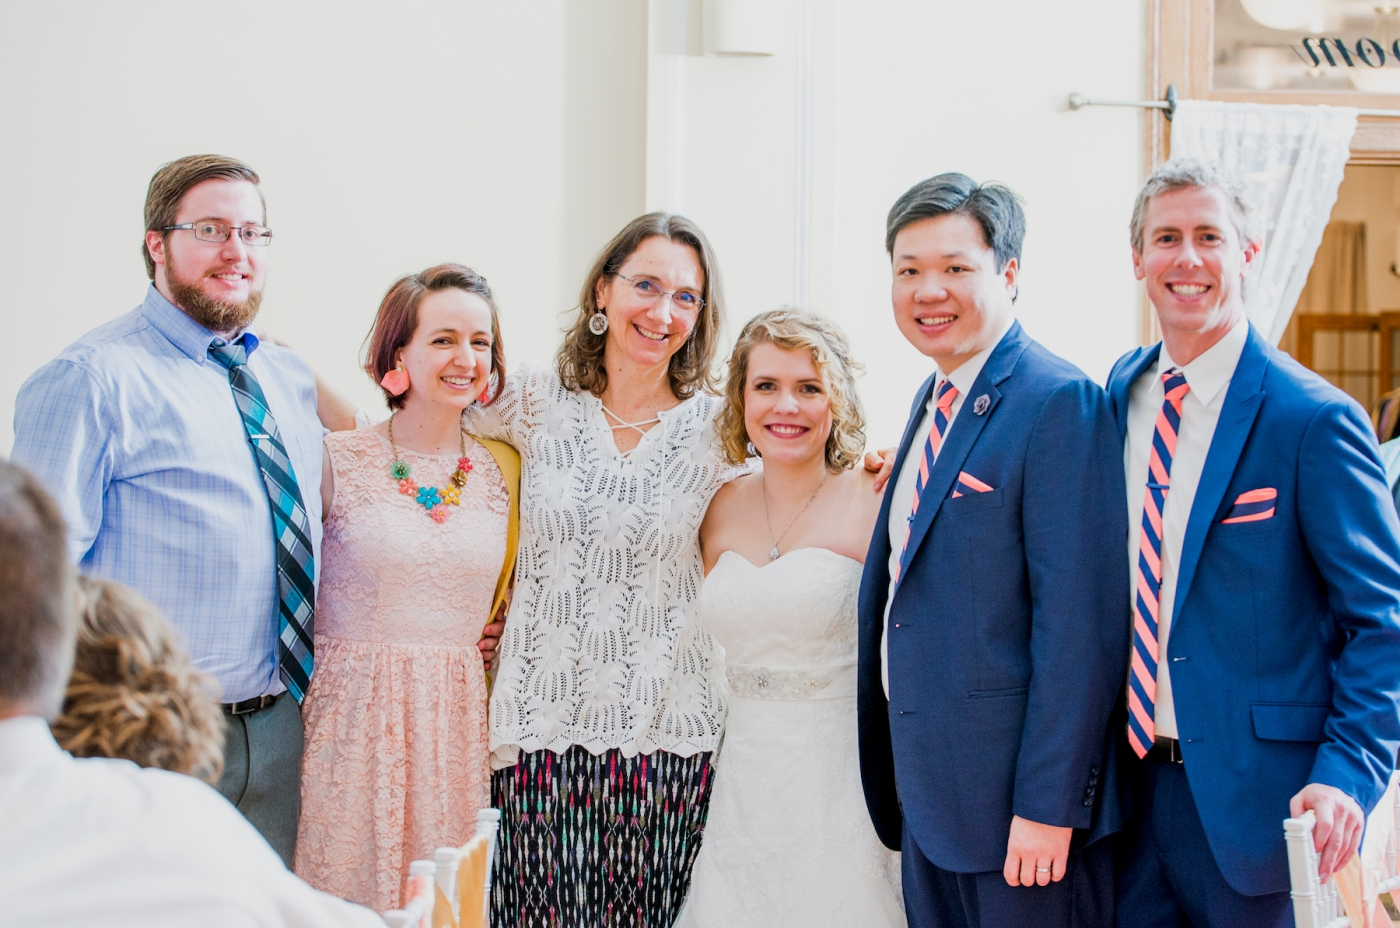 DSC_3227Everett_Wedding_Ballroom_Jane_Speleers_photography_Rachel_and_Edmund_reception_2017